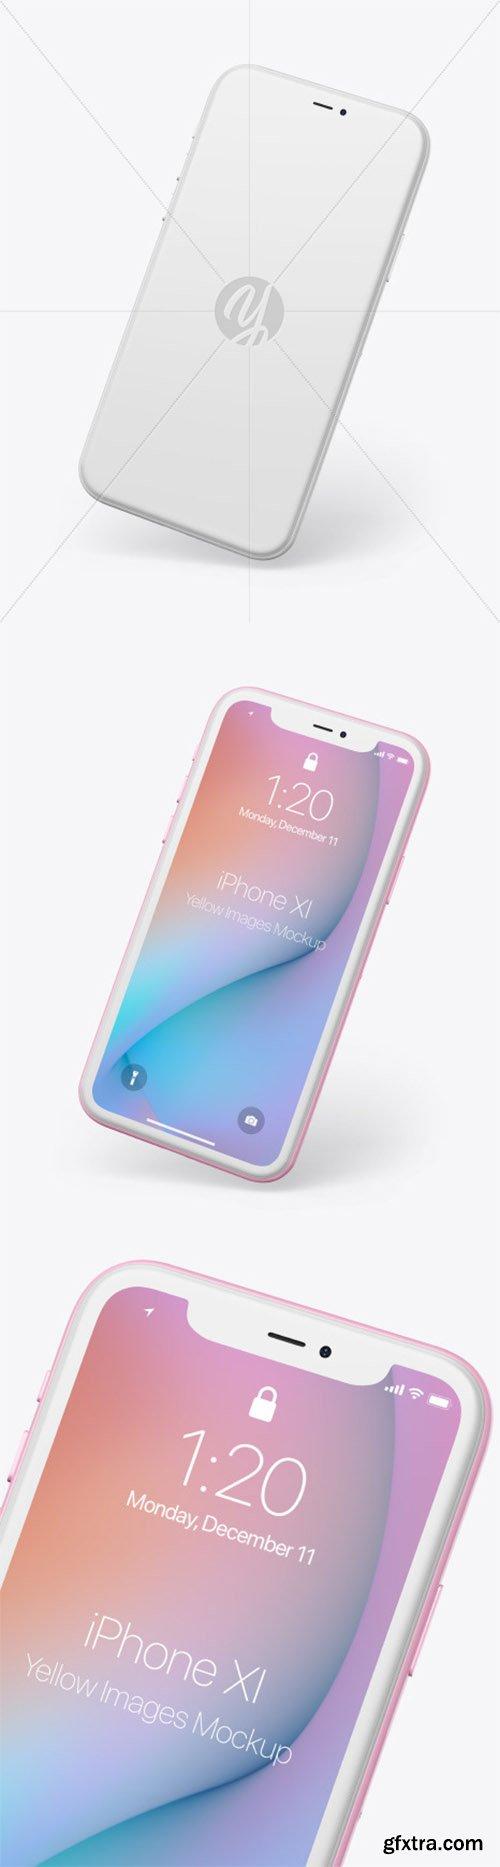 Clay Apple iPhone 11 Pro Mockup 65933